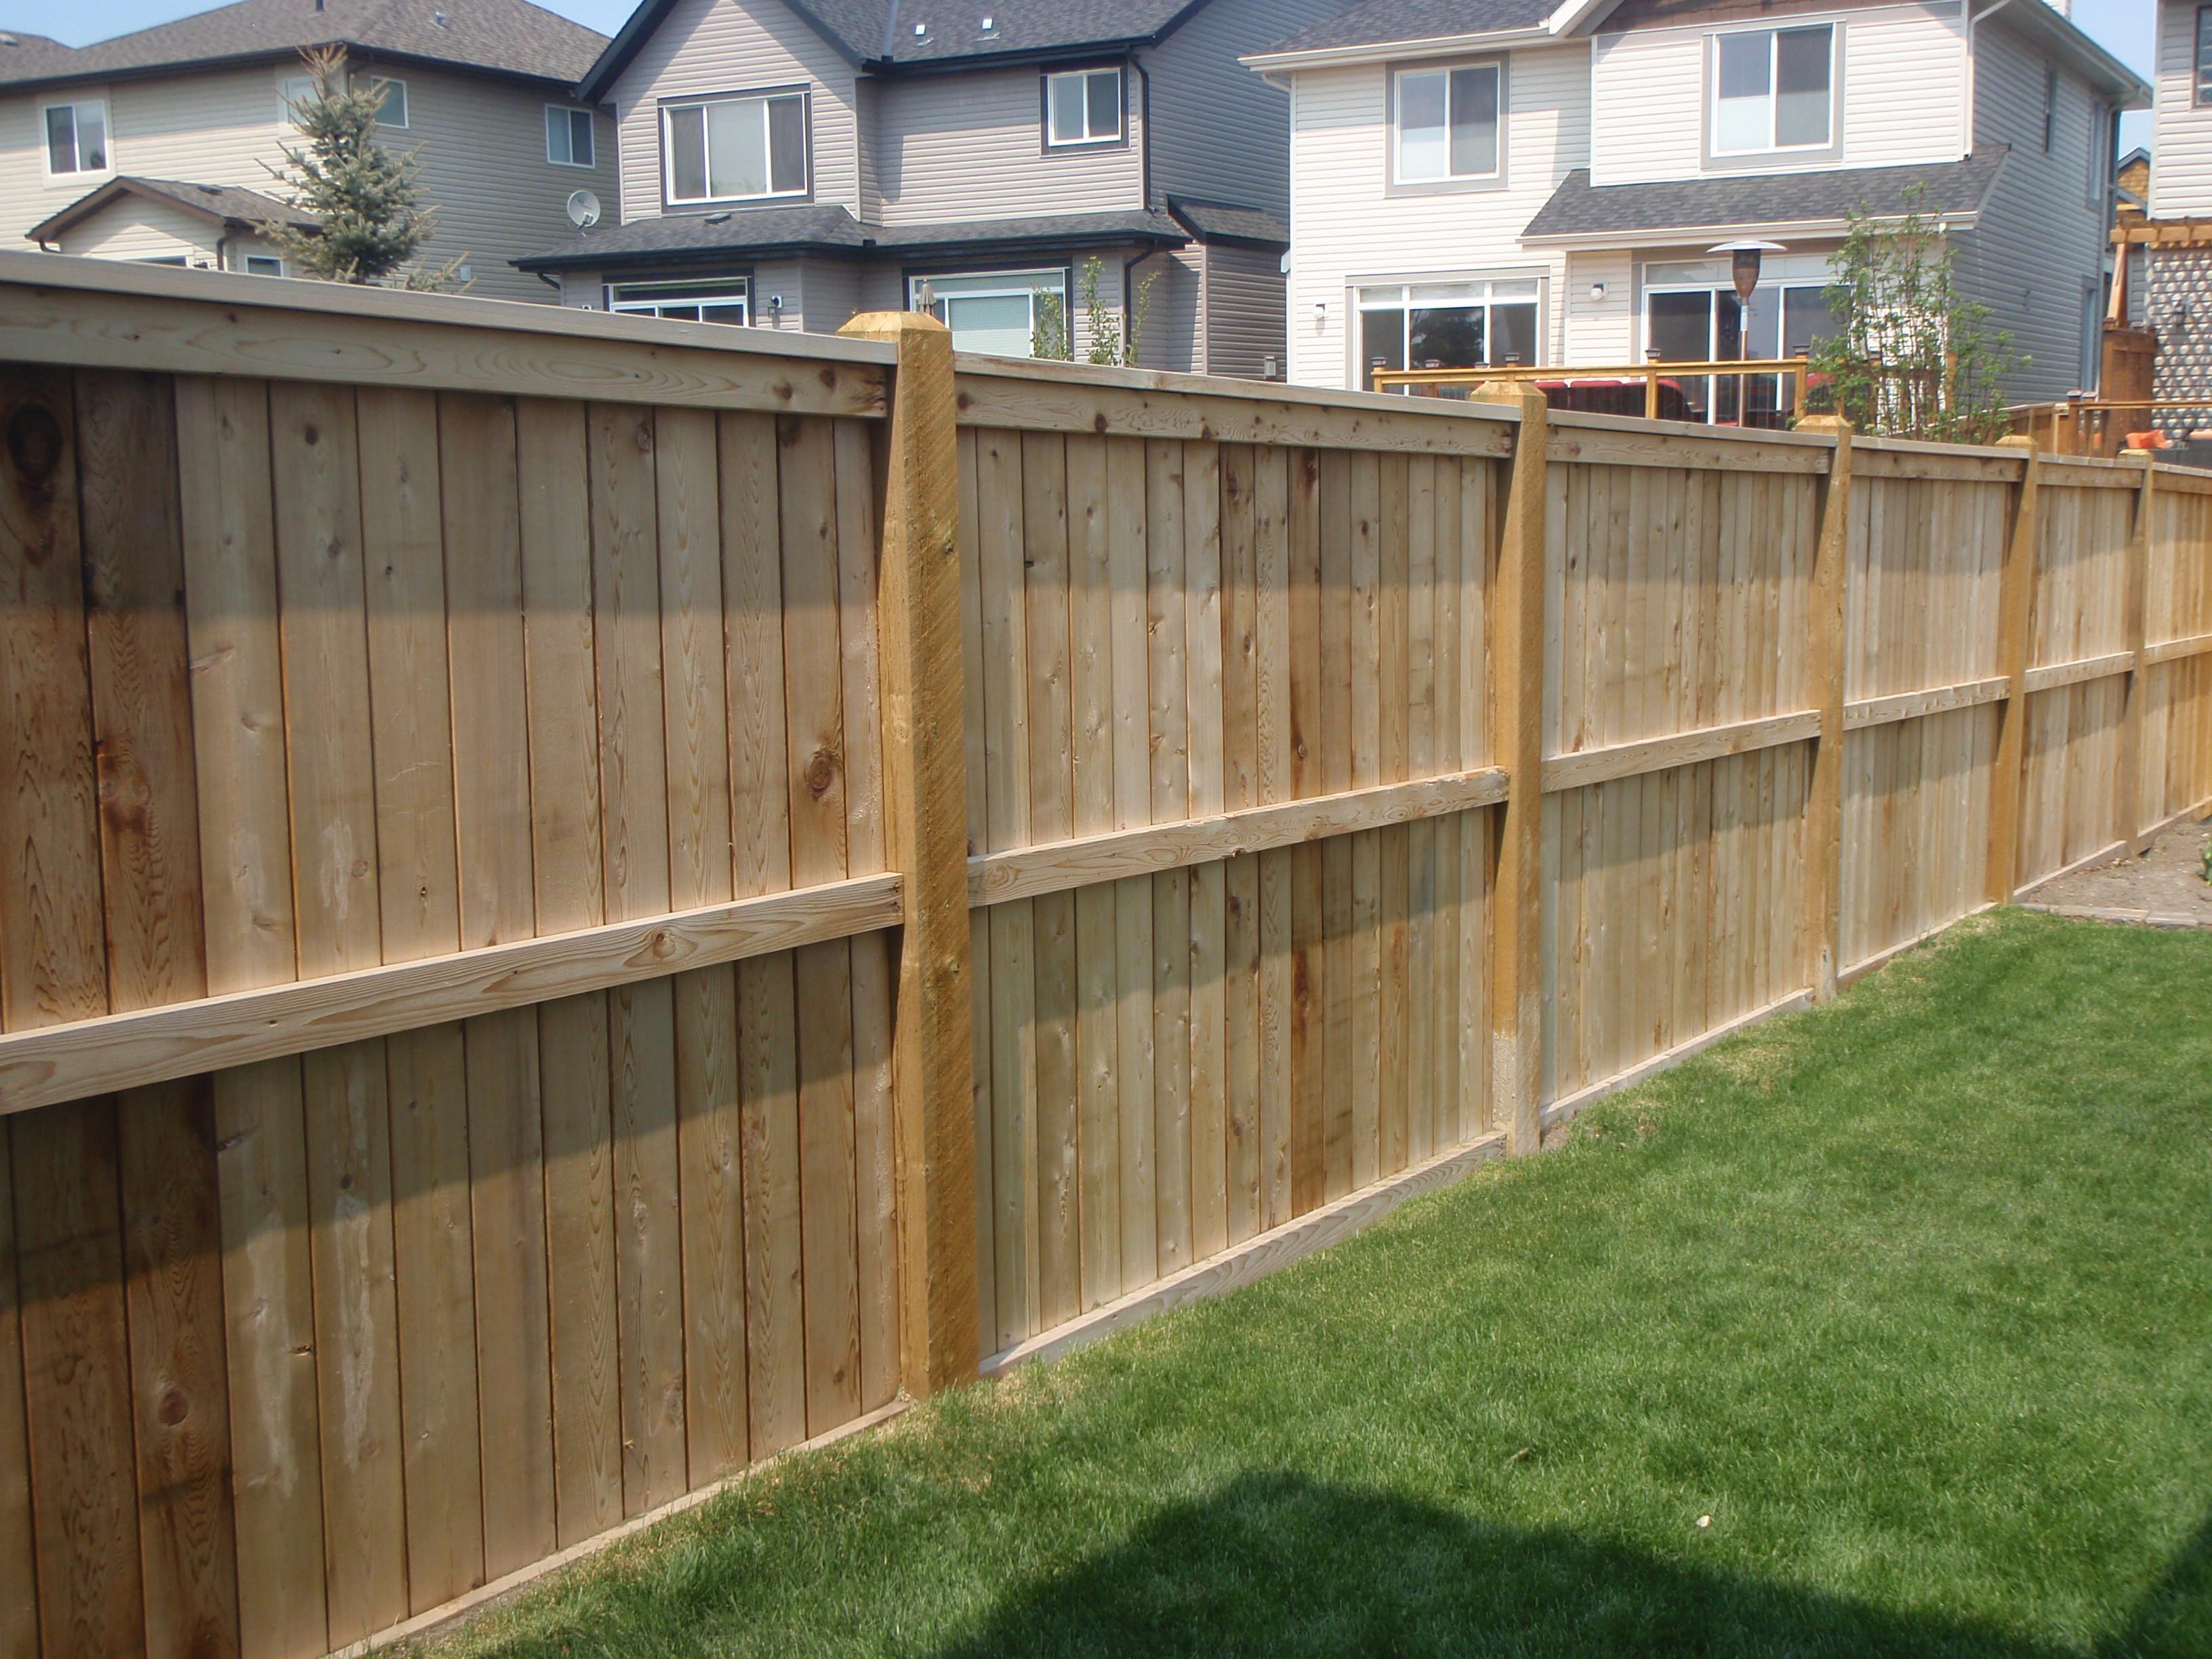 Backyard Fencing Ideas - HomesFeed on Backyard Fence Decor Ideas id=33628